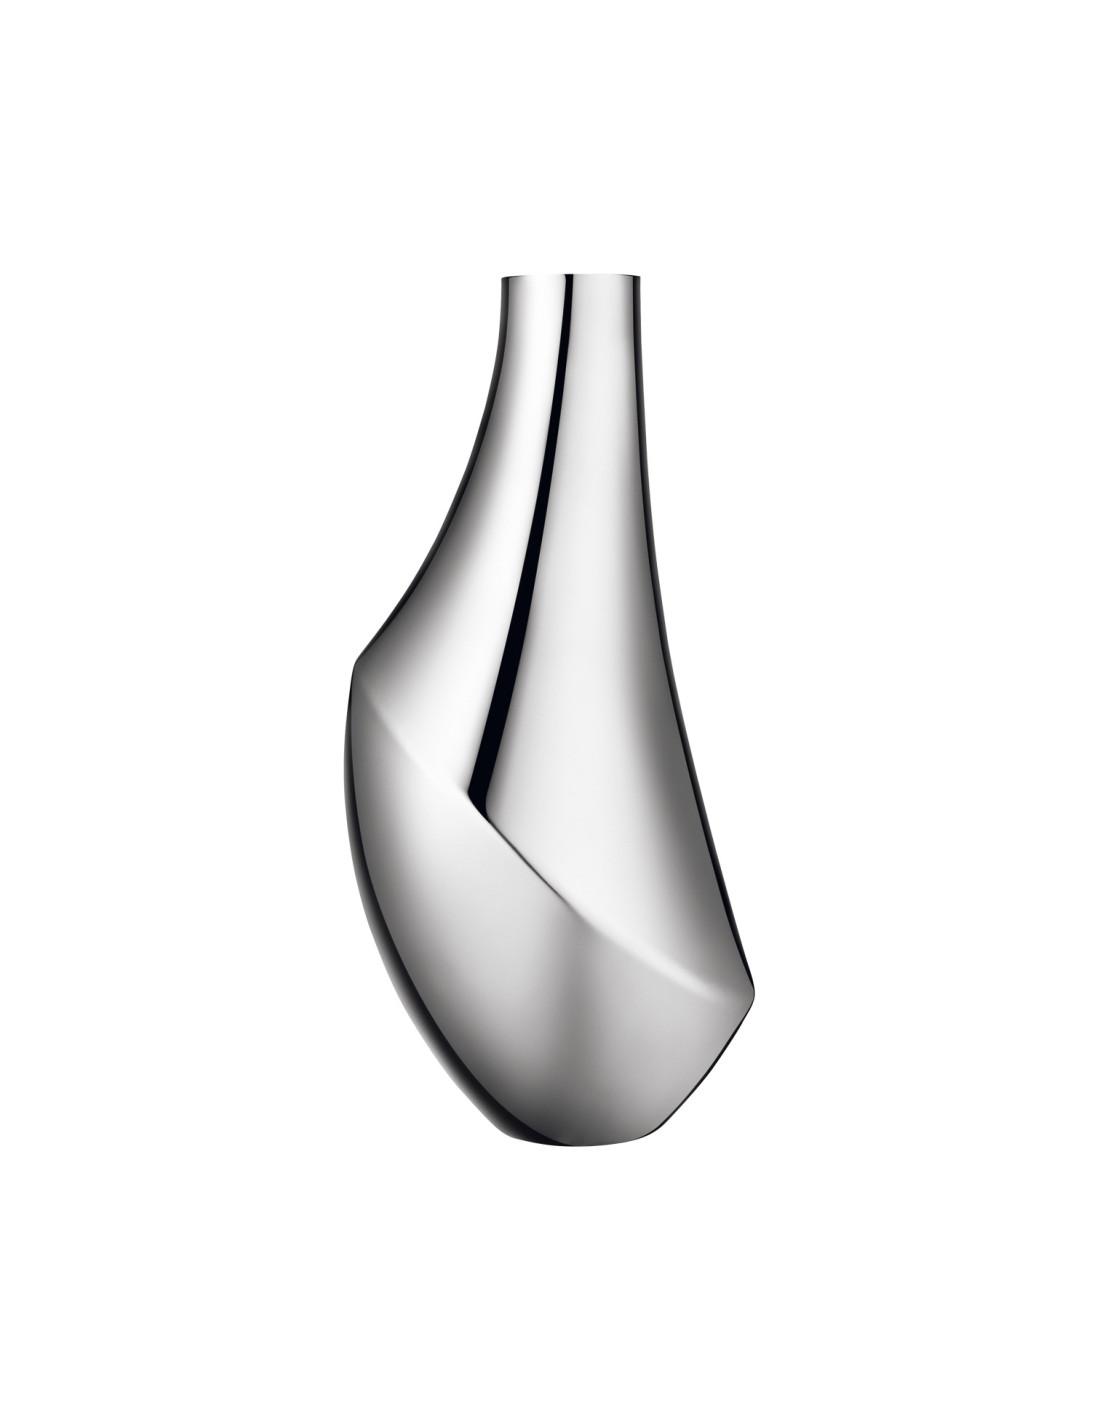 Flora Vase By Todd Bracher Georg Jensen La Boutique Danoise